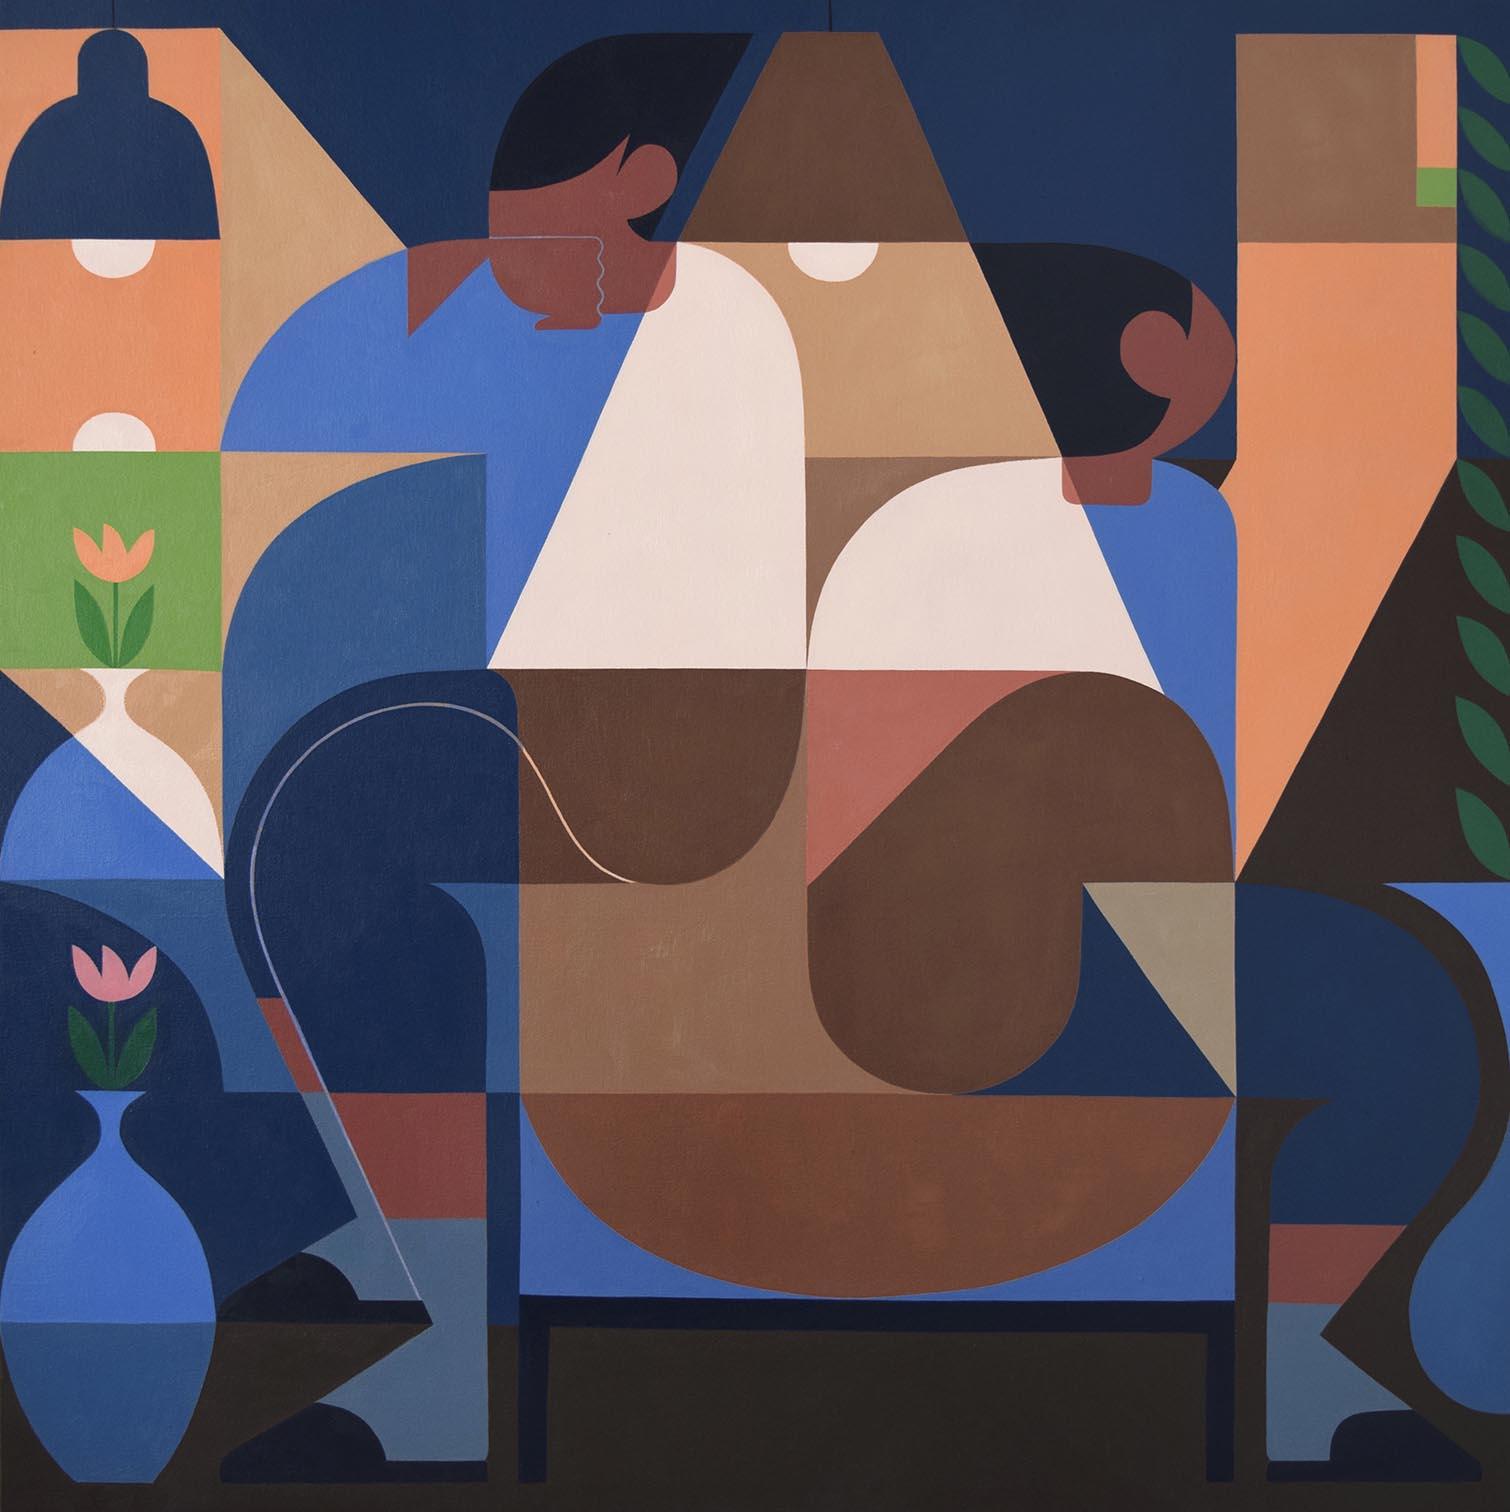 Adrian Kay Wong, Los Angeles based artist